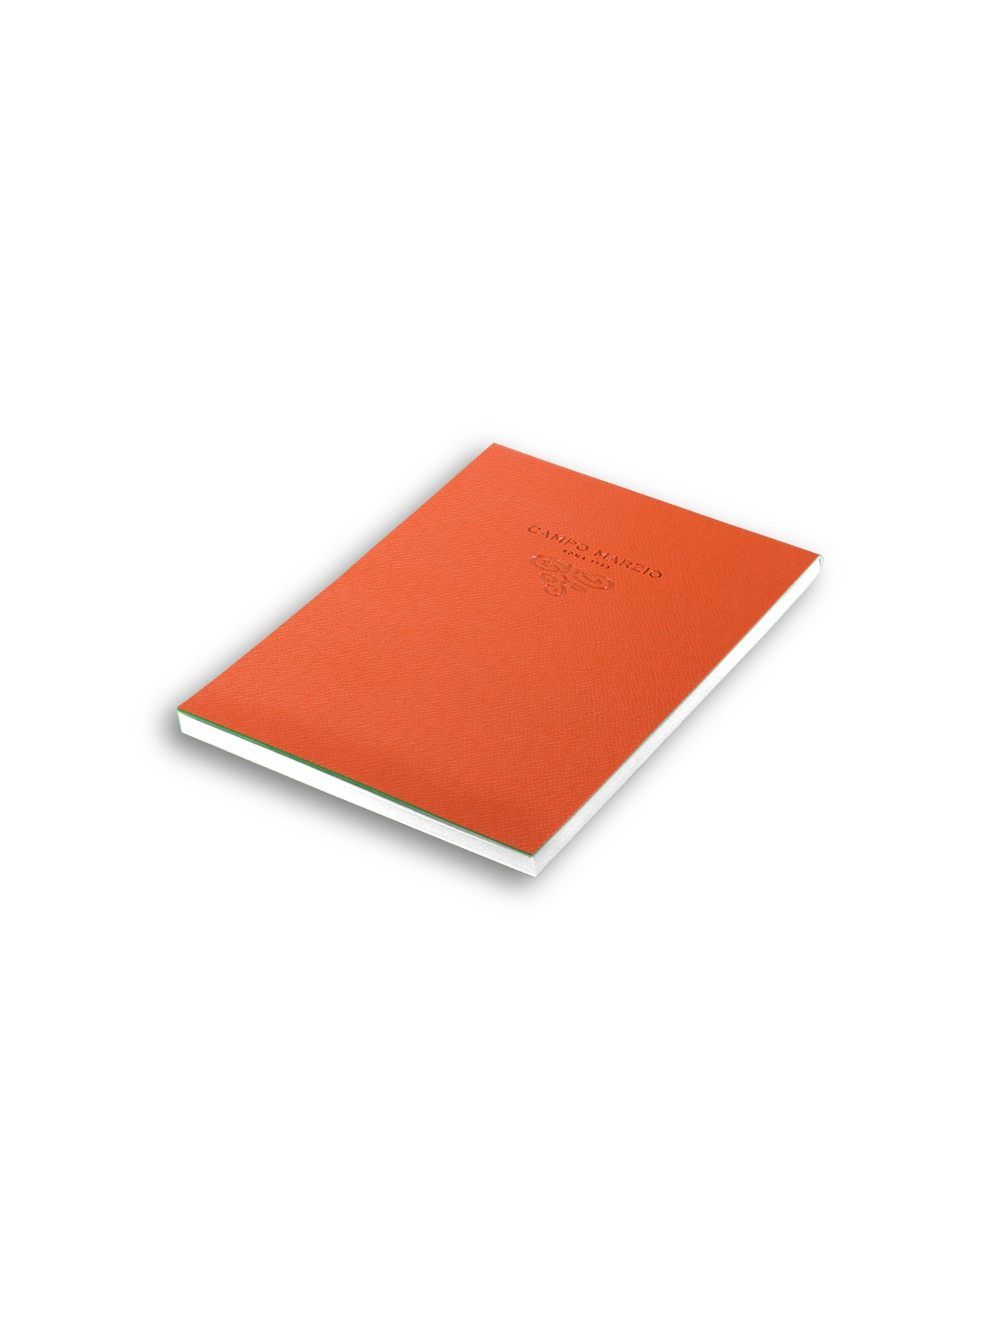 Notes 11x16 cm Saffiano (white internal paper)